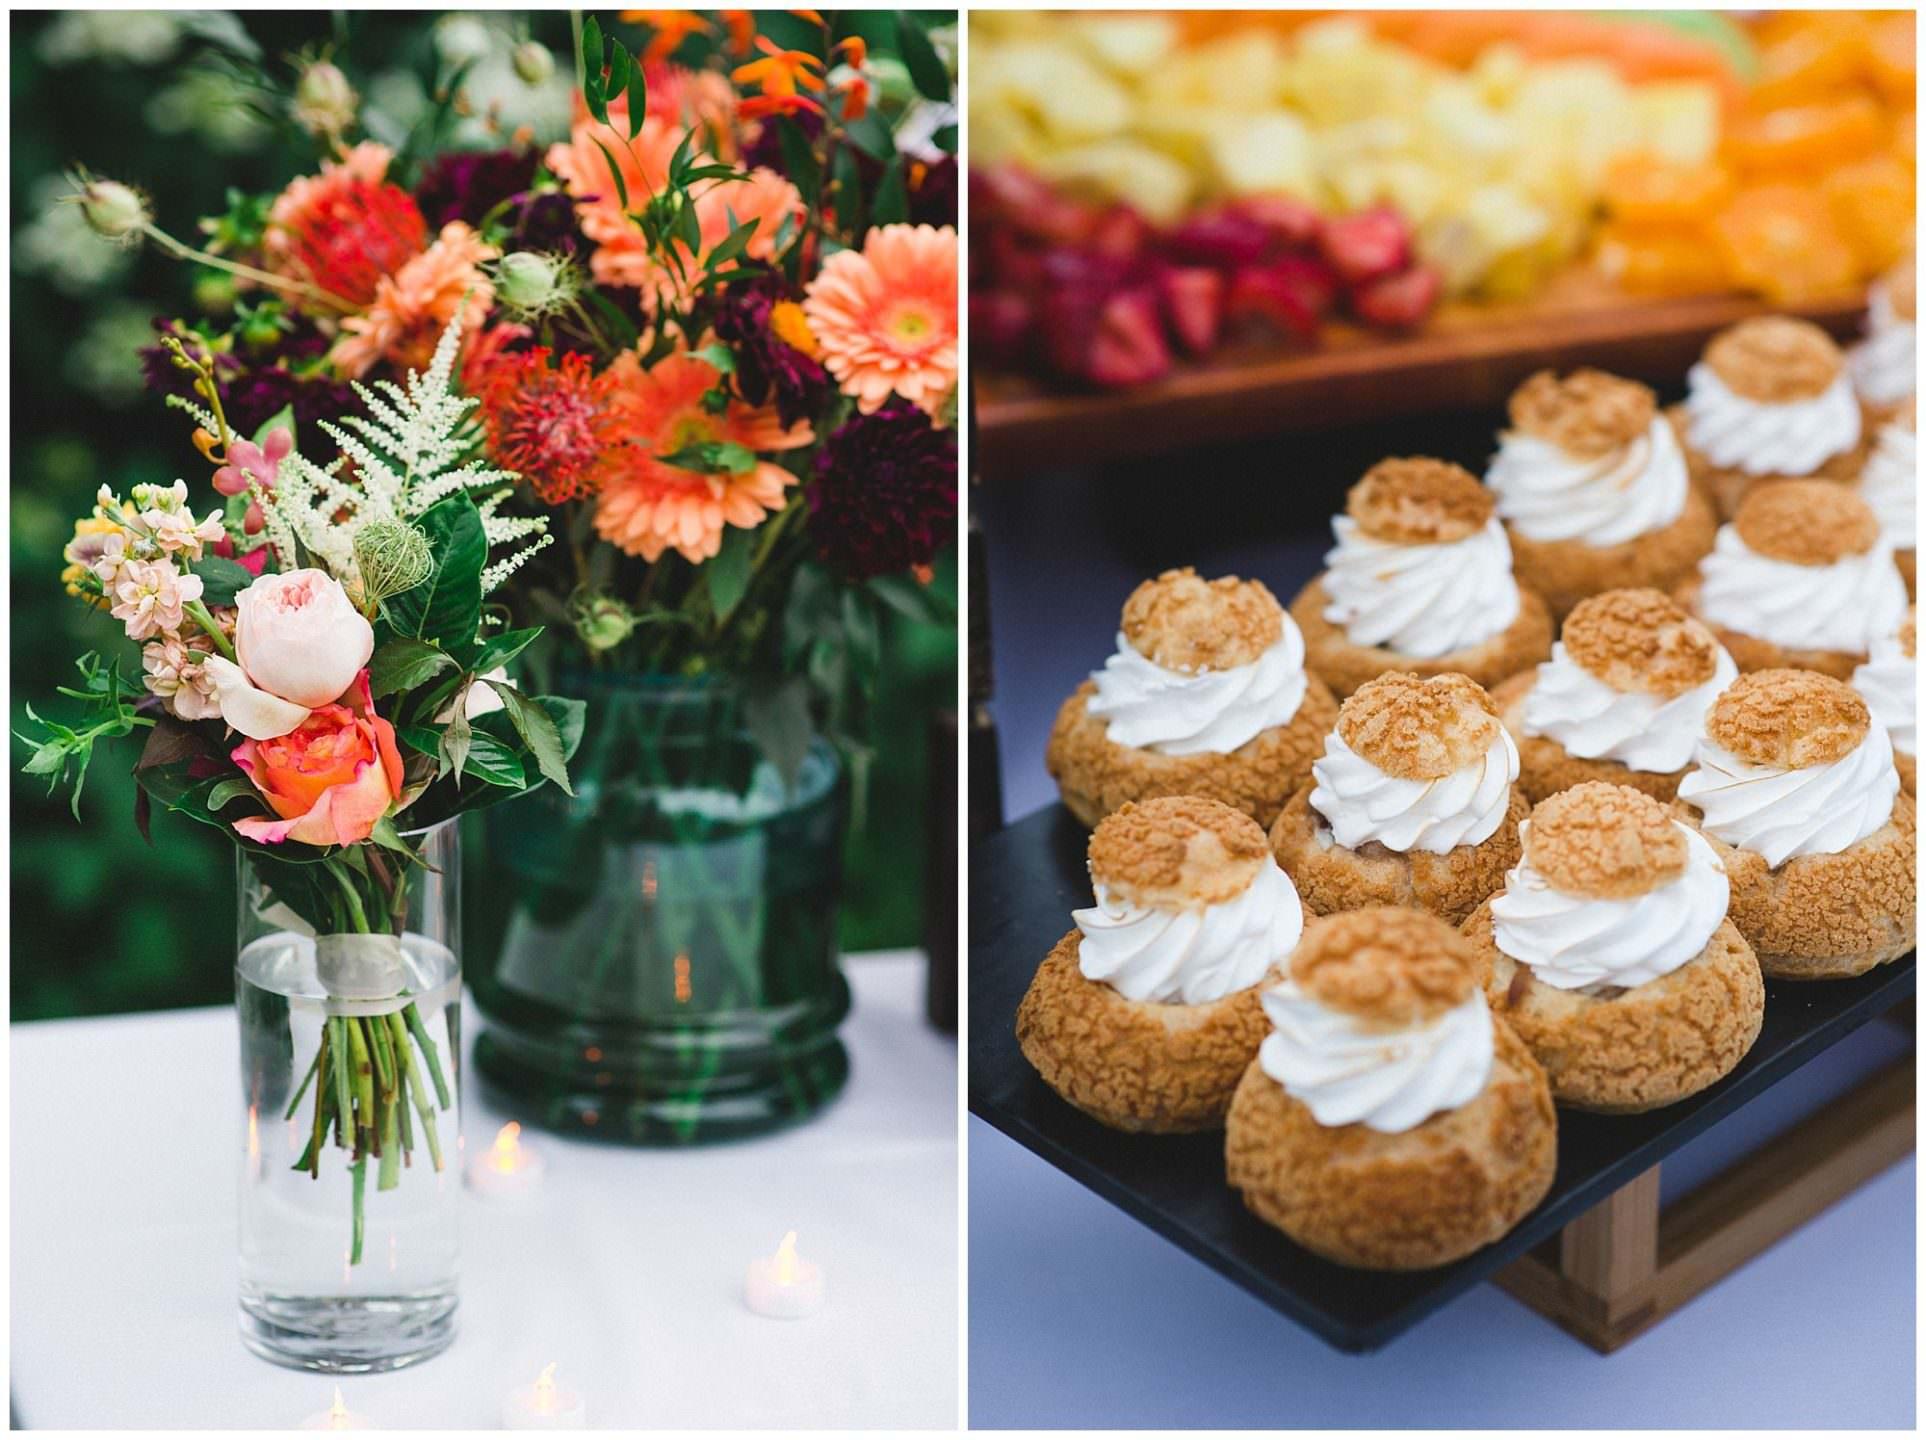 wedding details and deserts at UBC Botanical Gardens